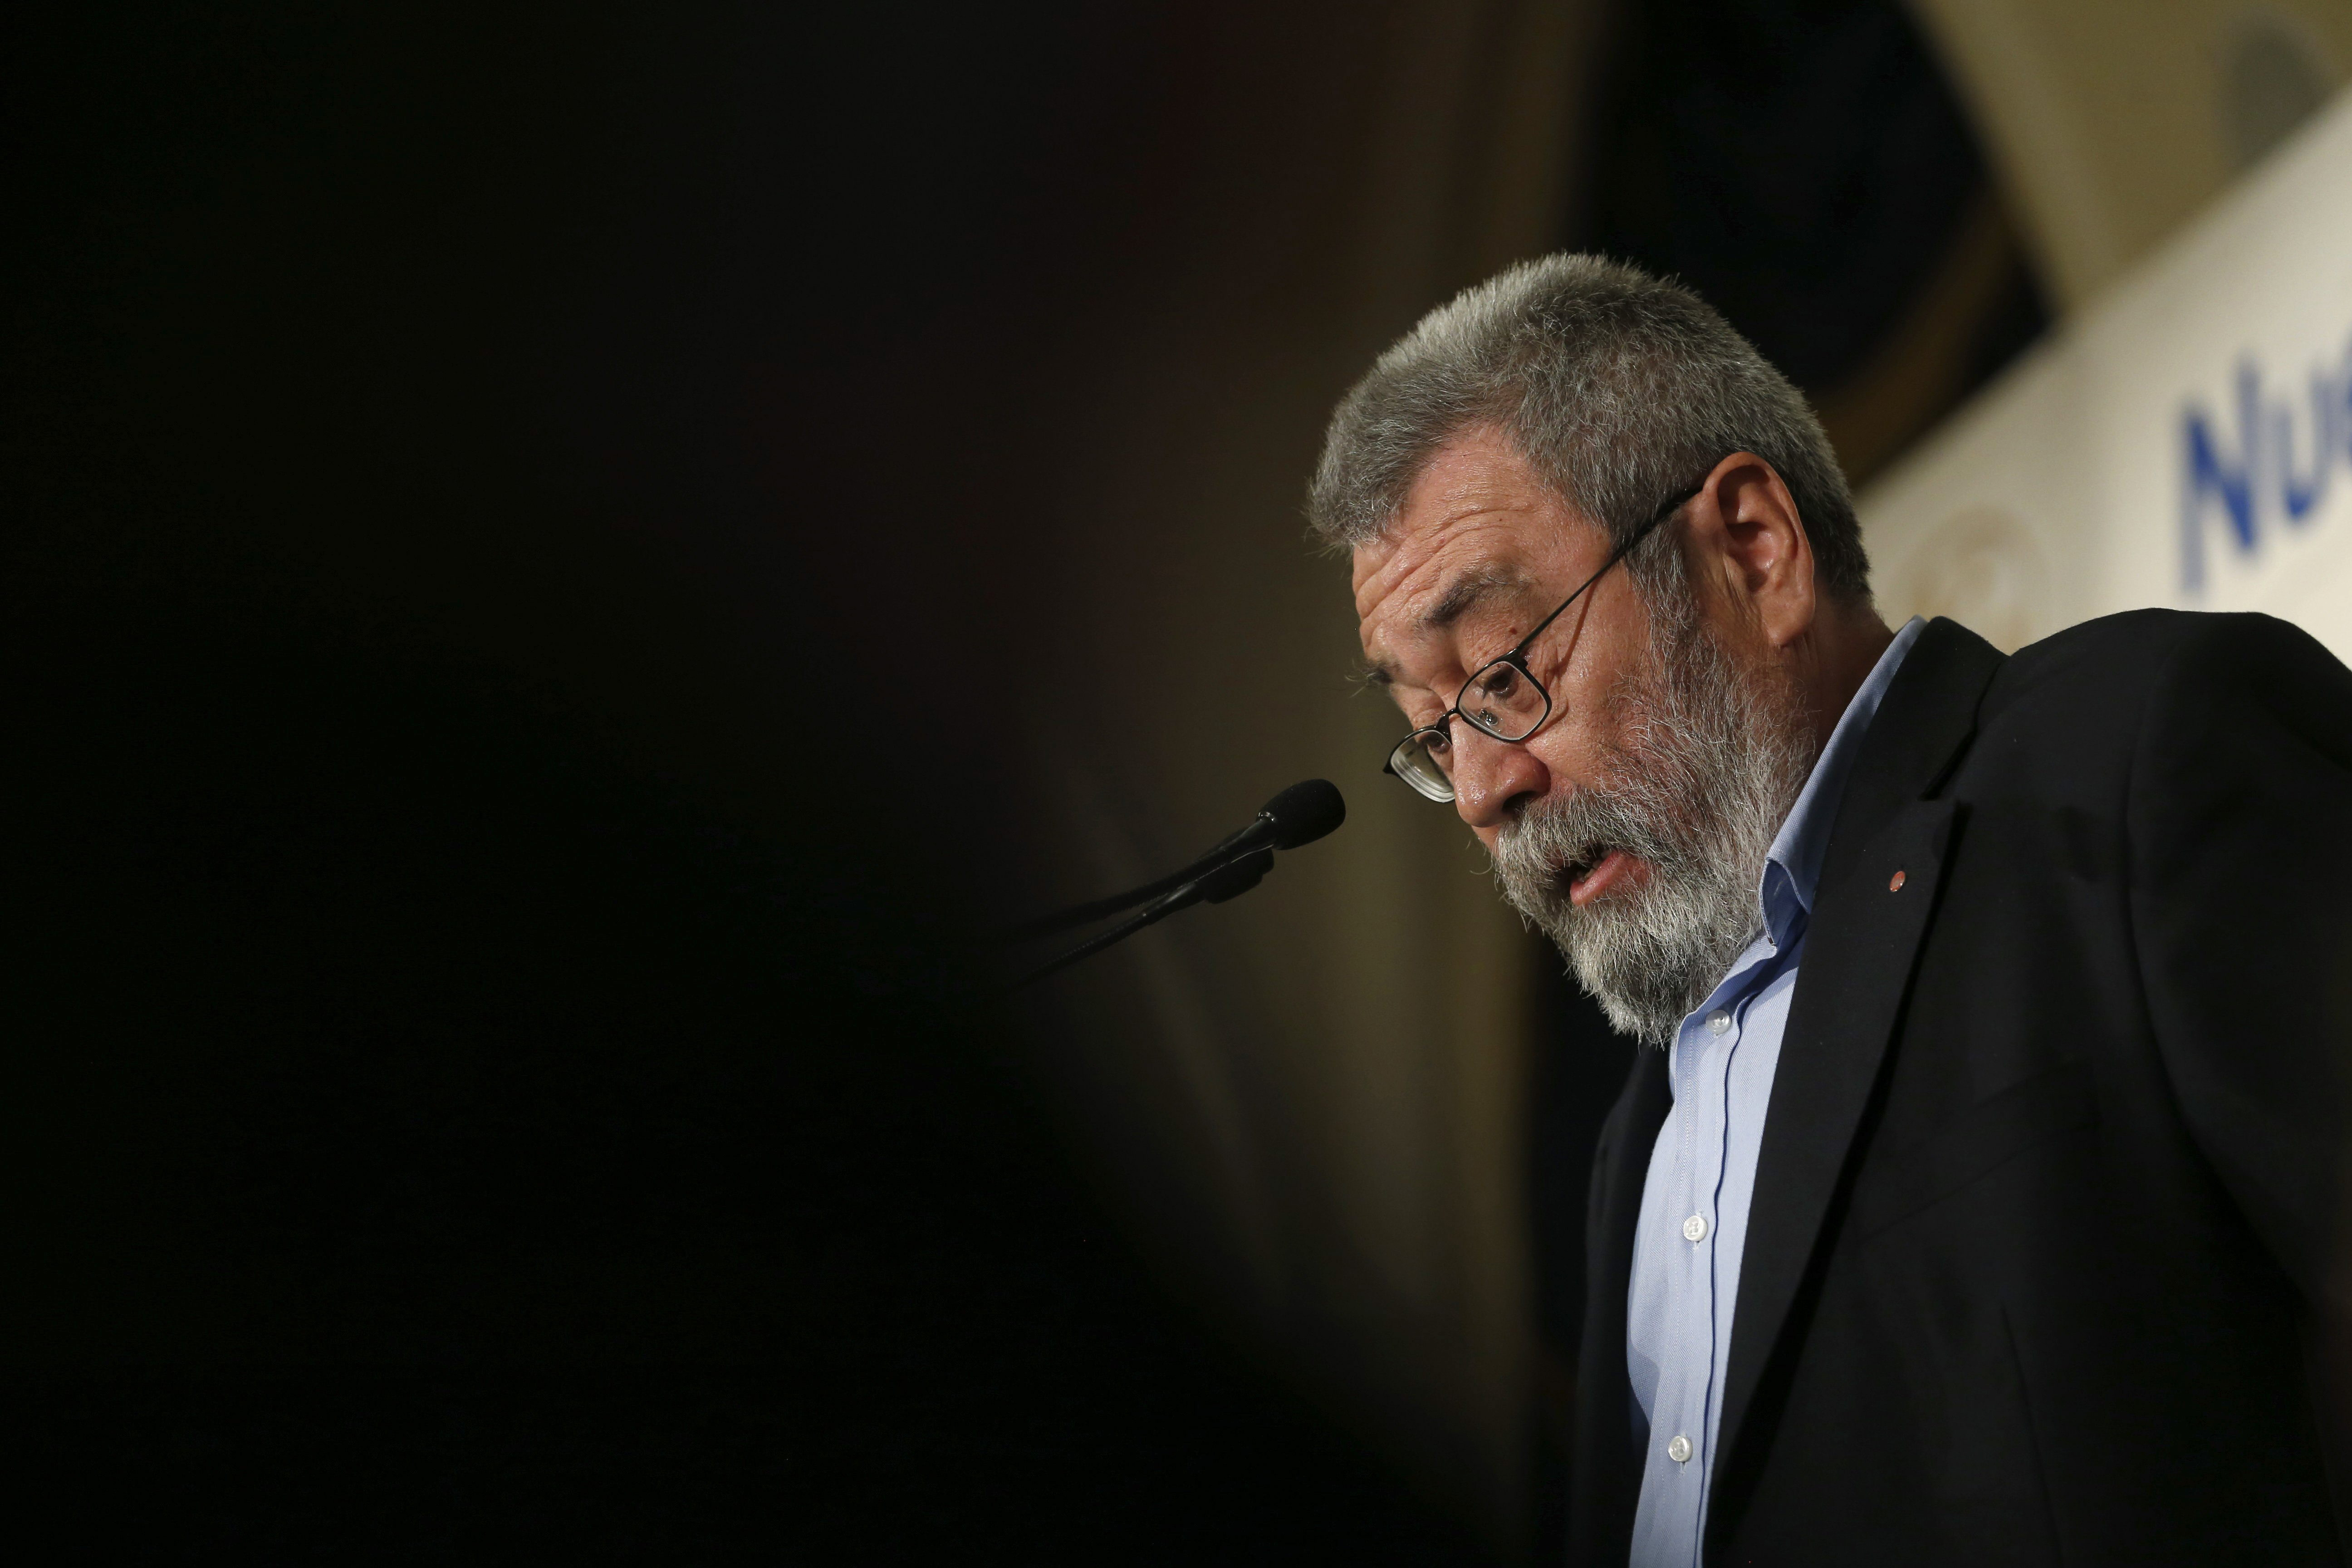 Méndez avisa de que si siguen los recortes España podría acabar como Grecia